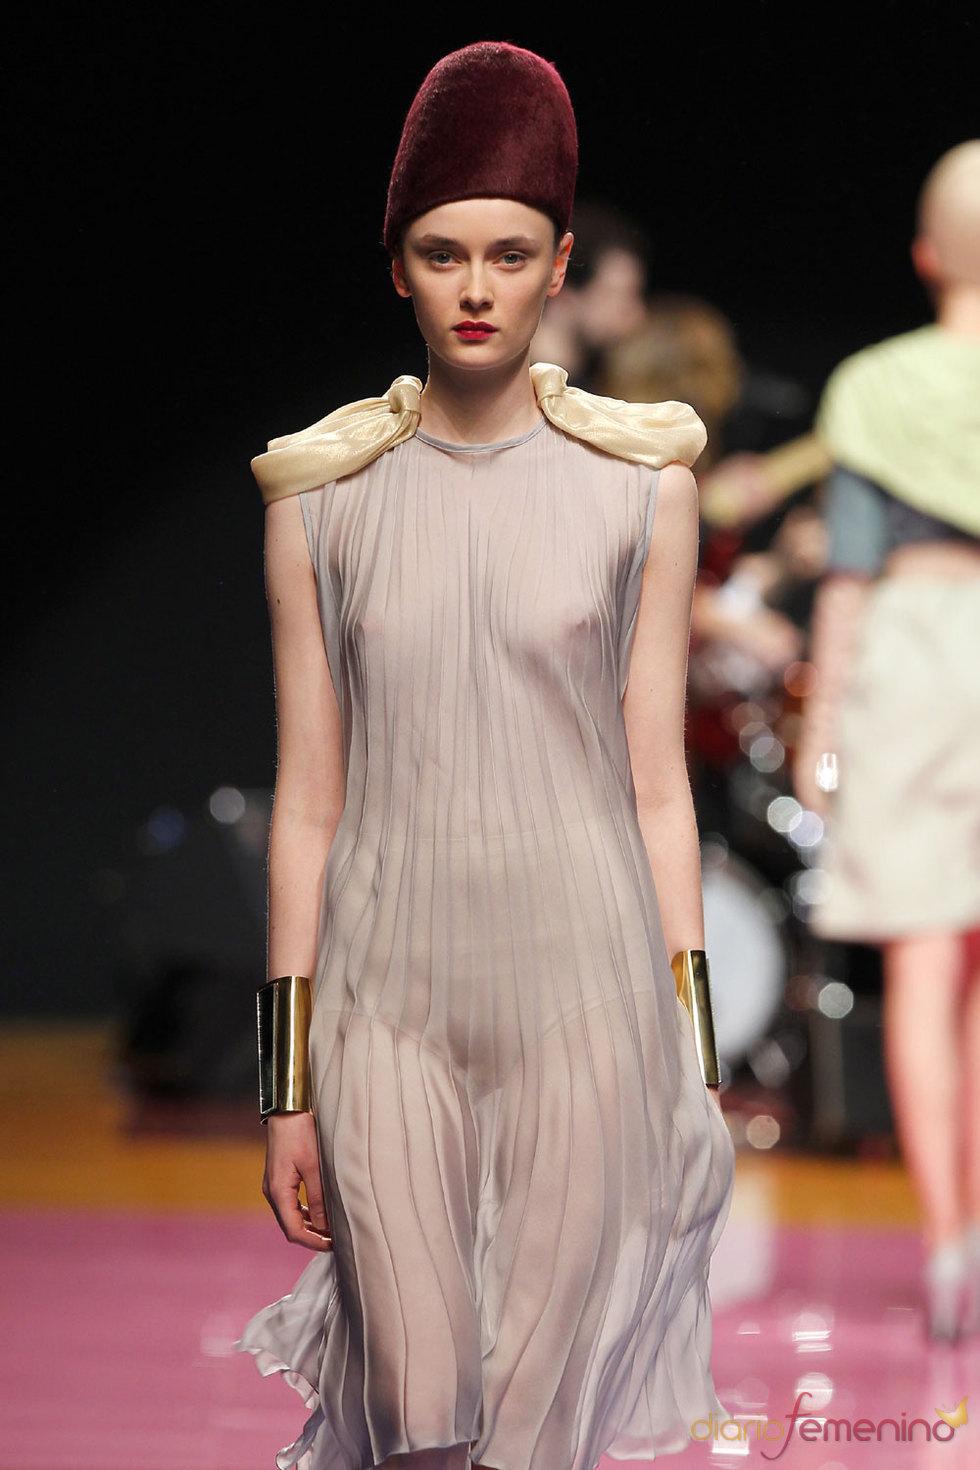 Moda Duyos en Cibeles Fashion Week 2010